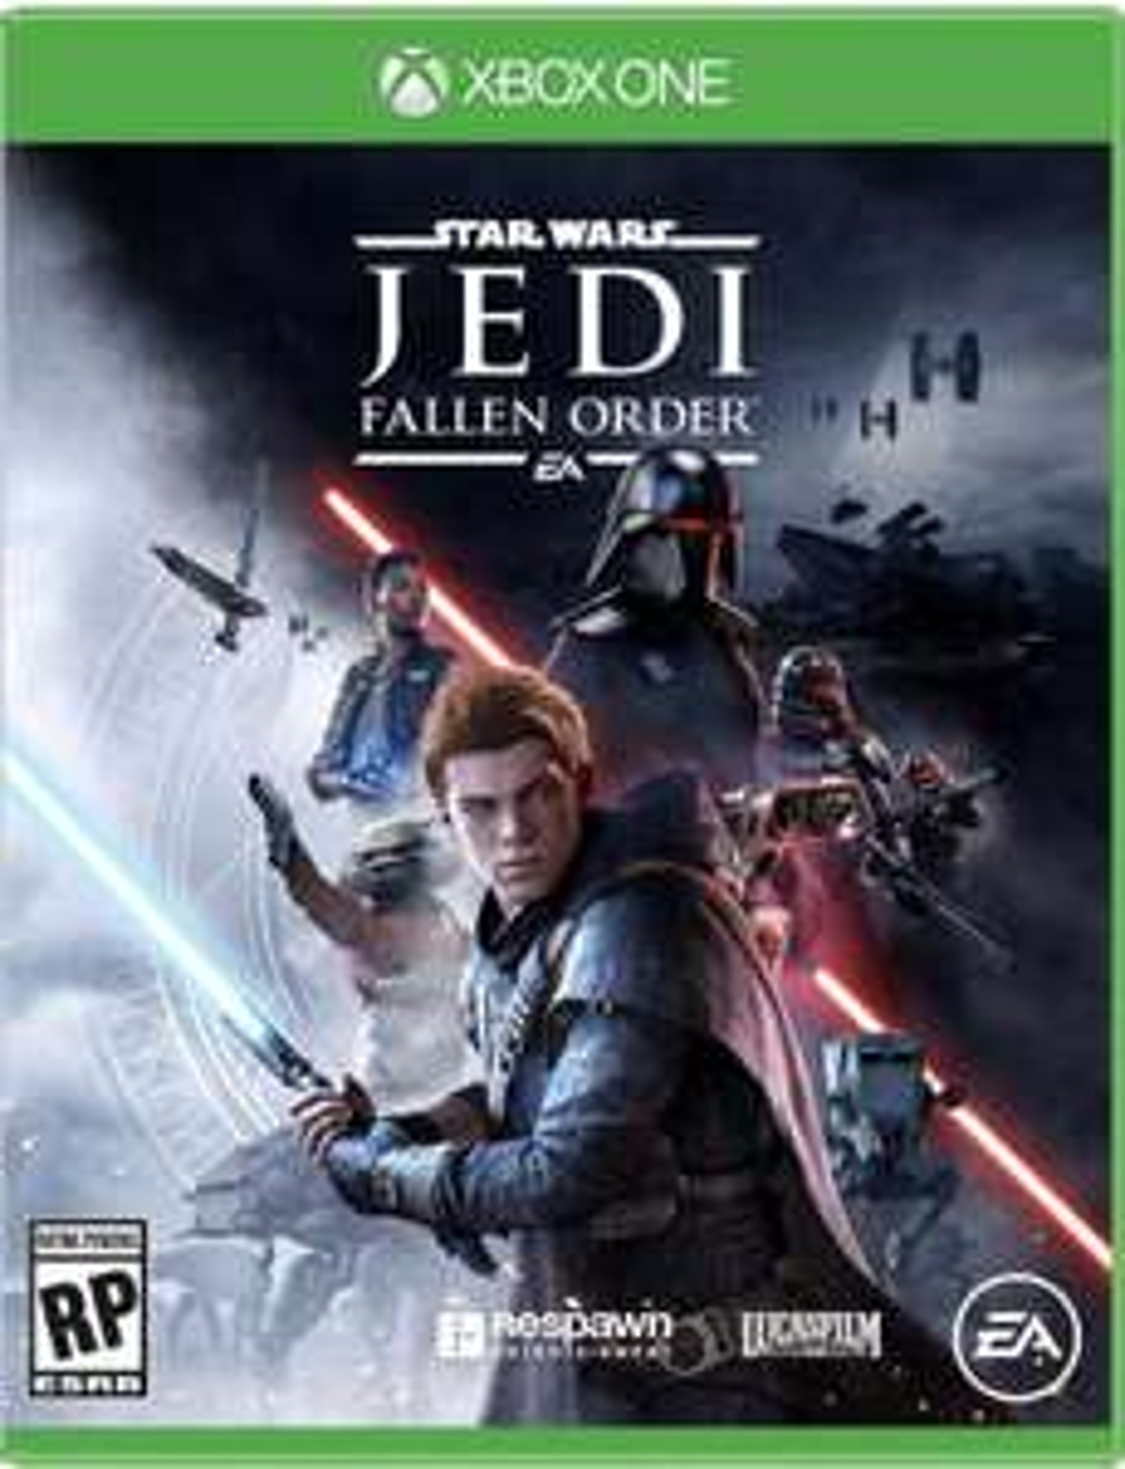 Amazon: Star Wars Jedi Fallen Order Xbox One - Xbox One - Standard Edition